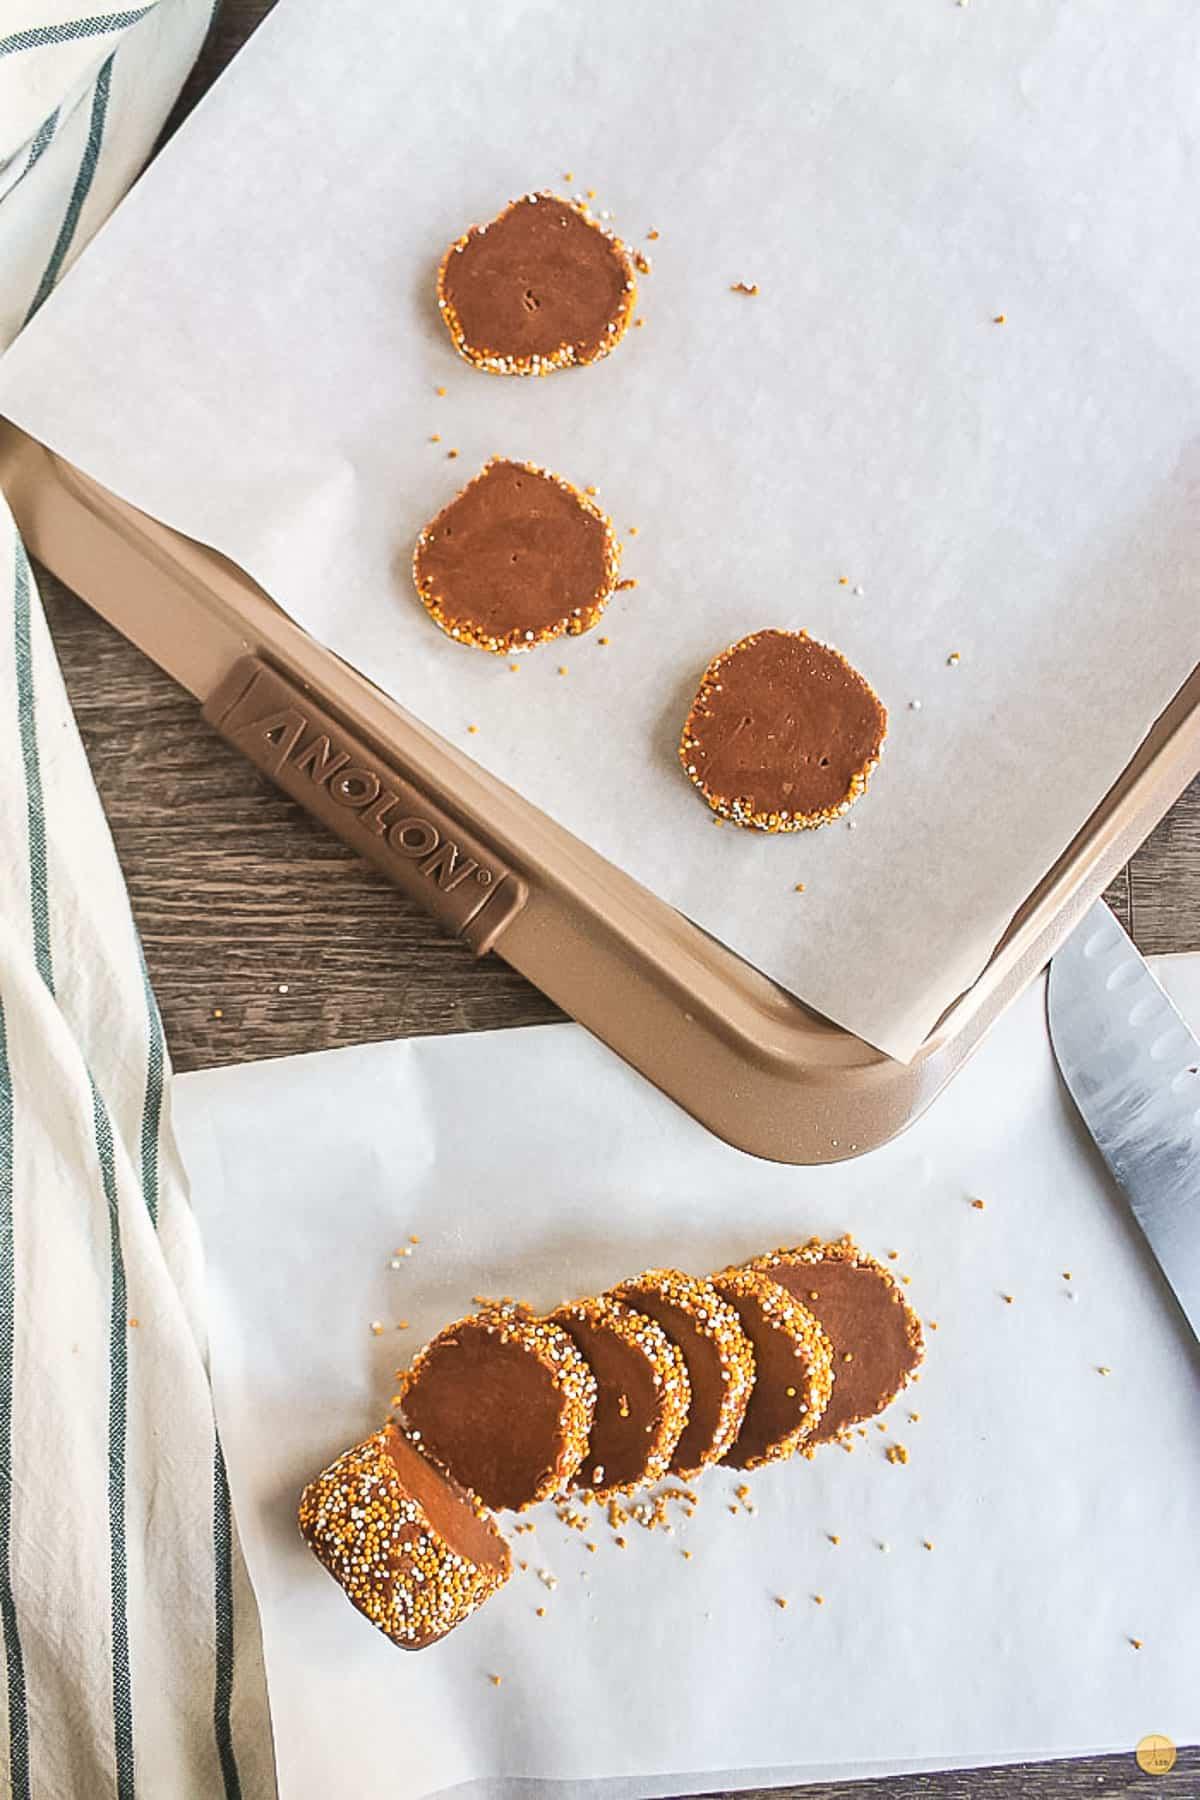 sliced icebox cookie dough on baking sheet